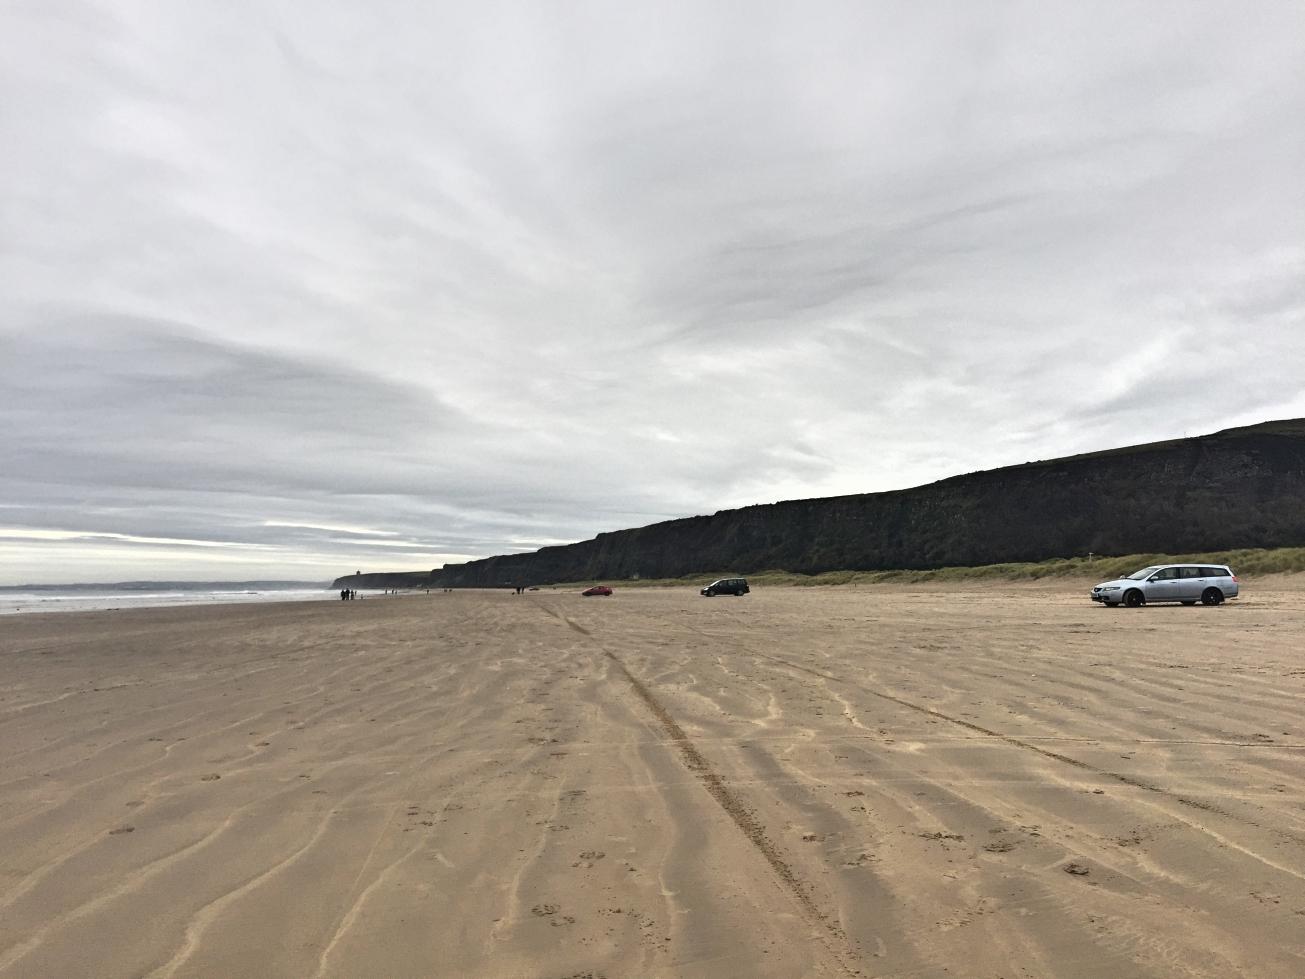 benone_beach_downhill_londonderry_limavady_niexplorer_ni_explorer_northern_ireland (11).jpg